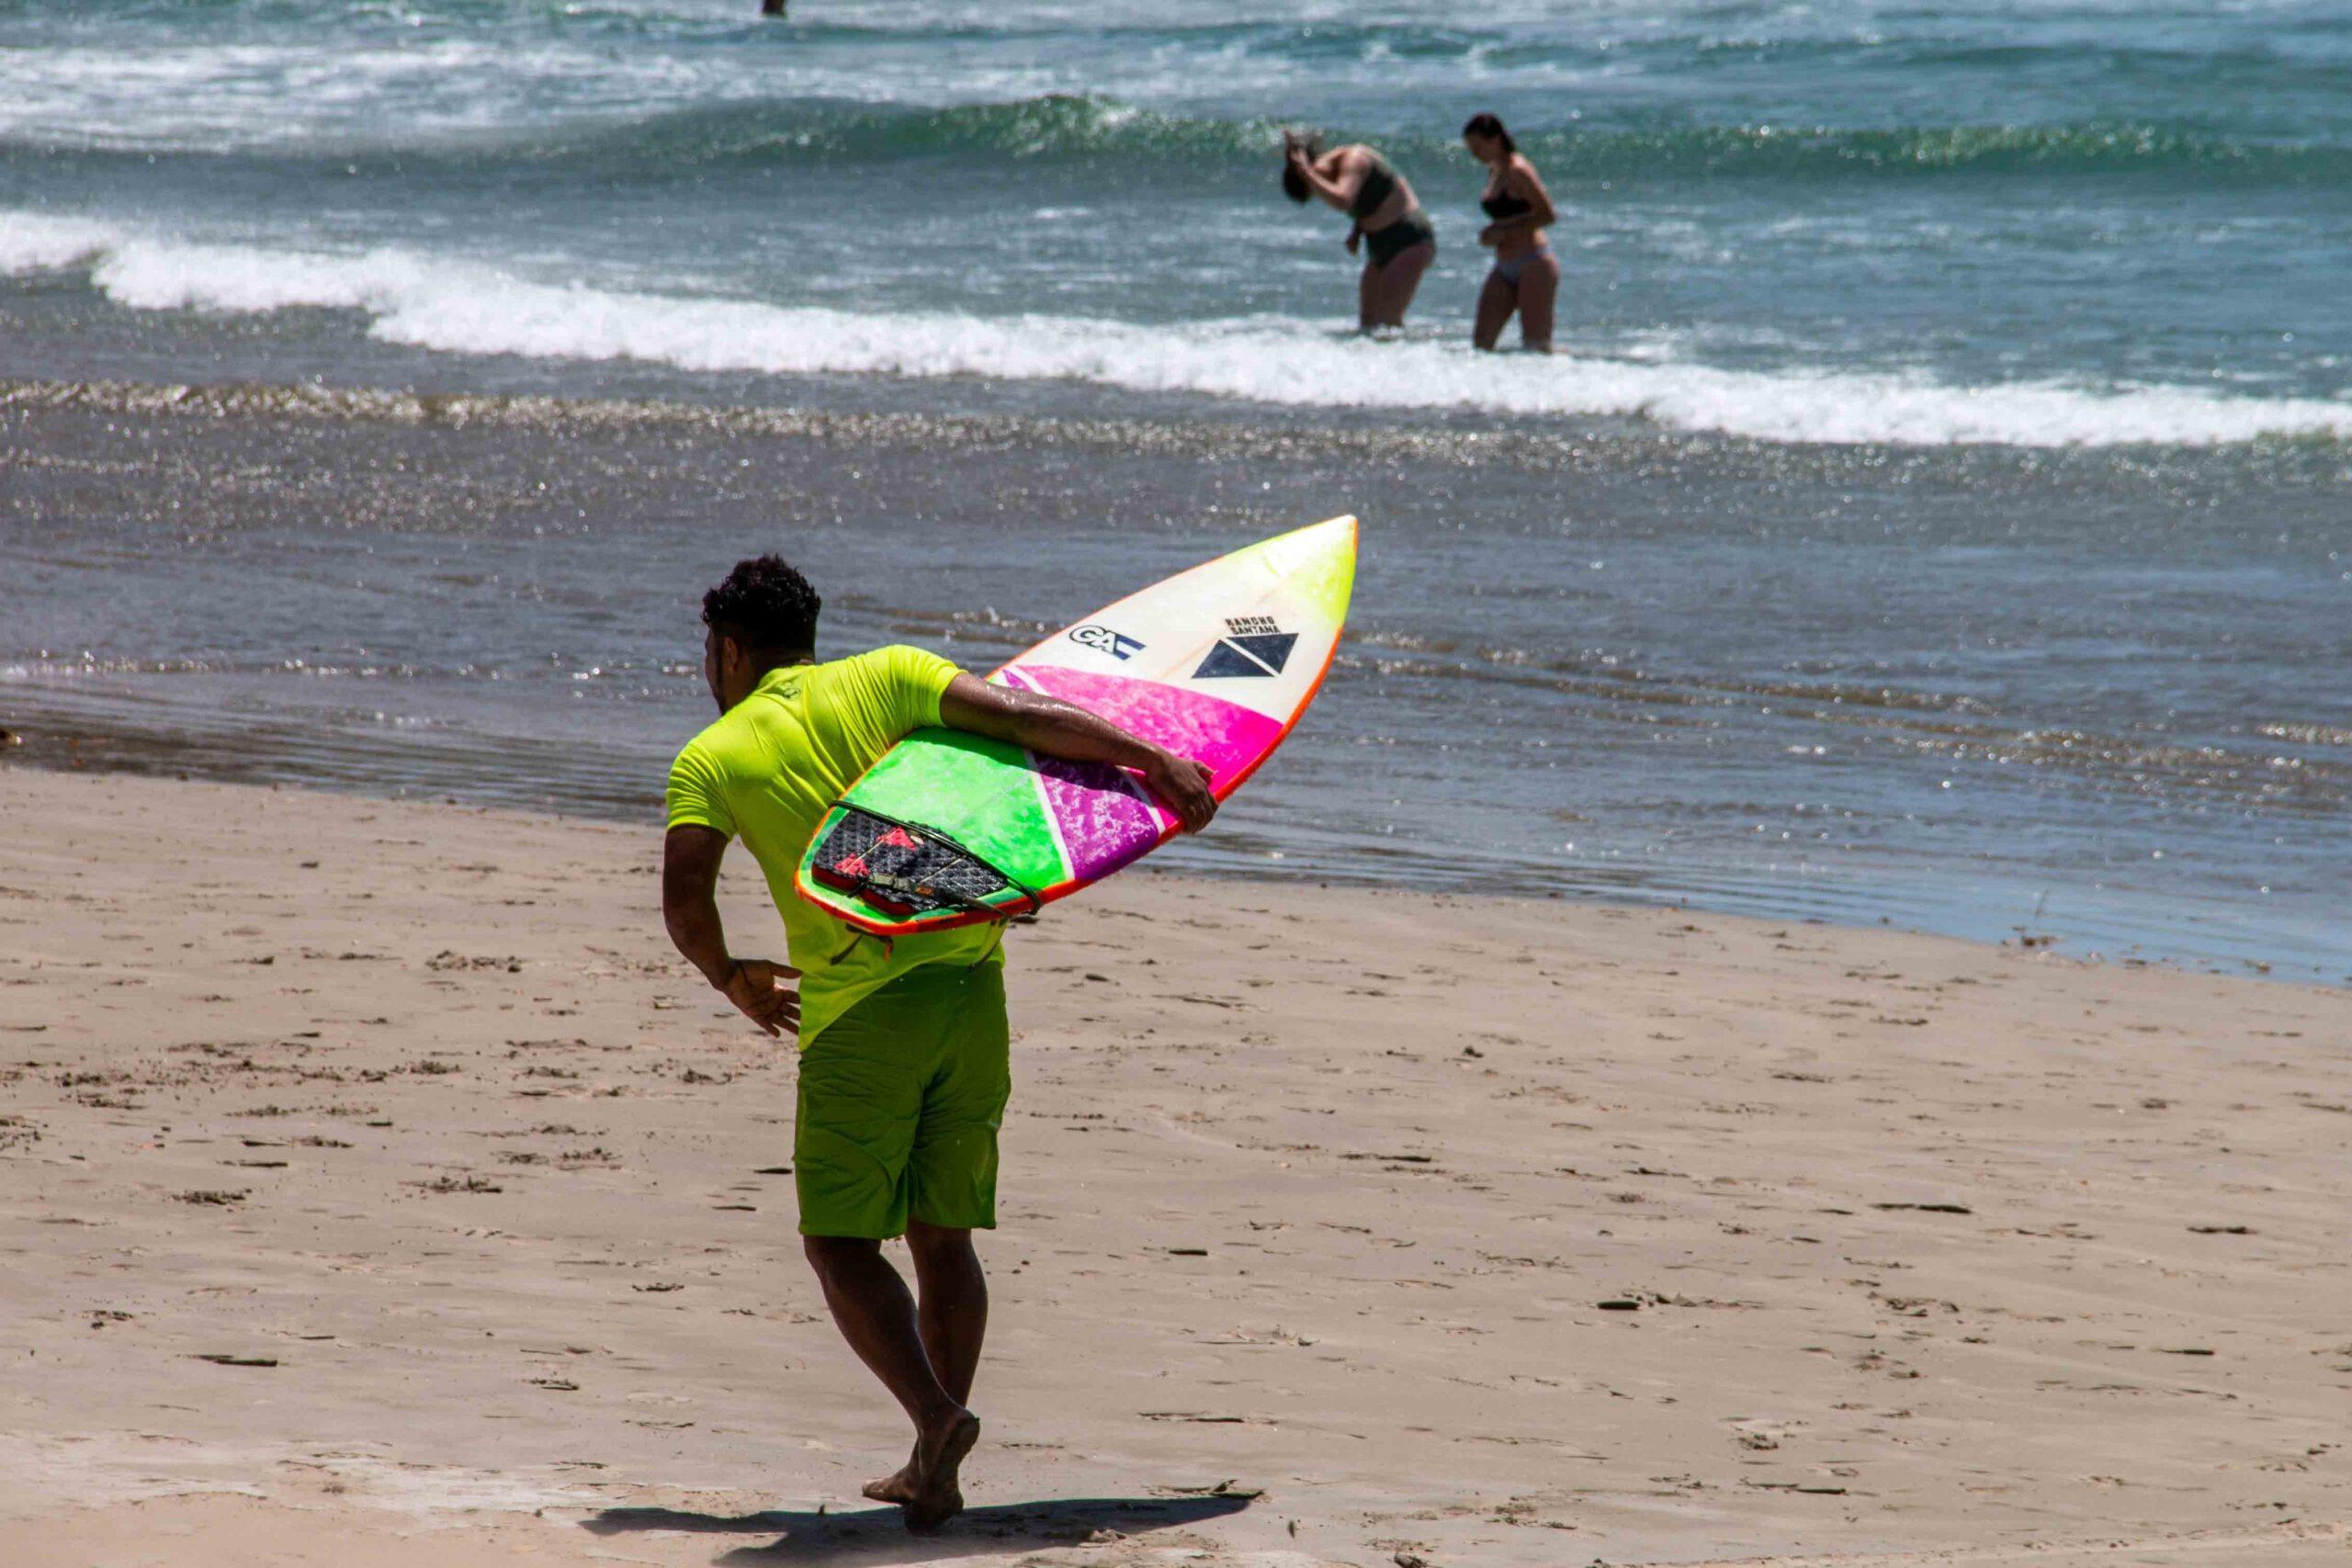 Off shore winds in Nicaragua